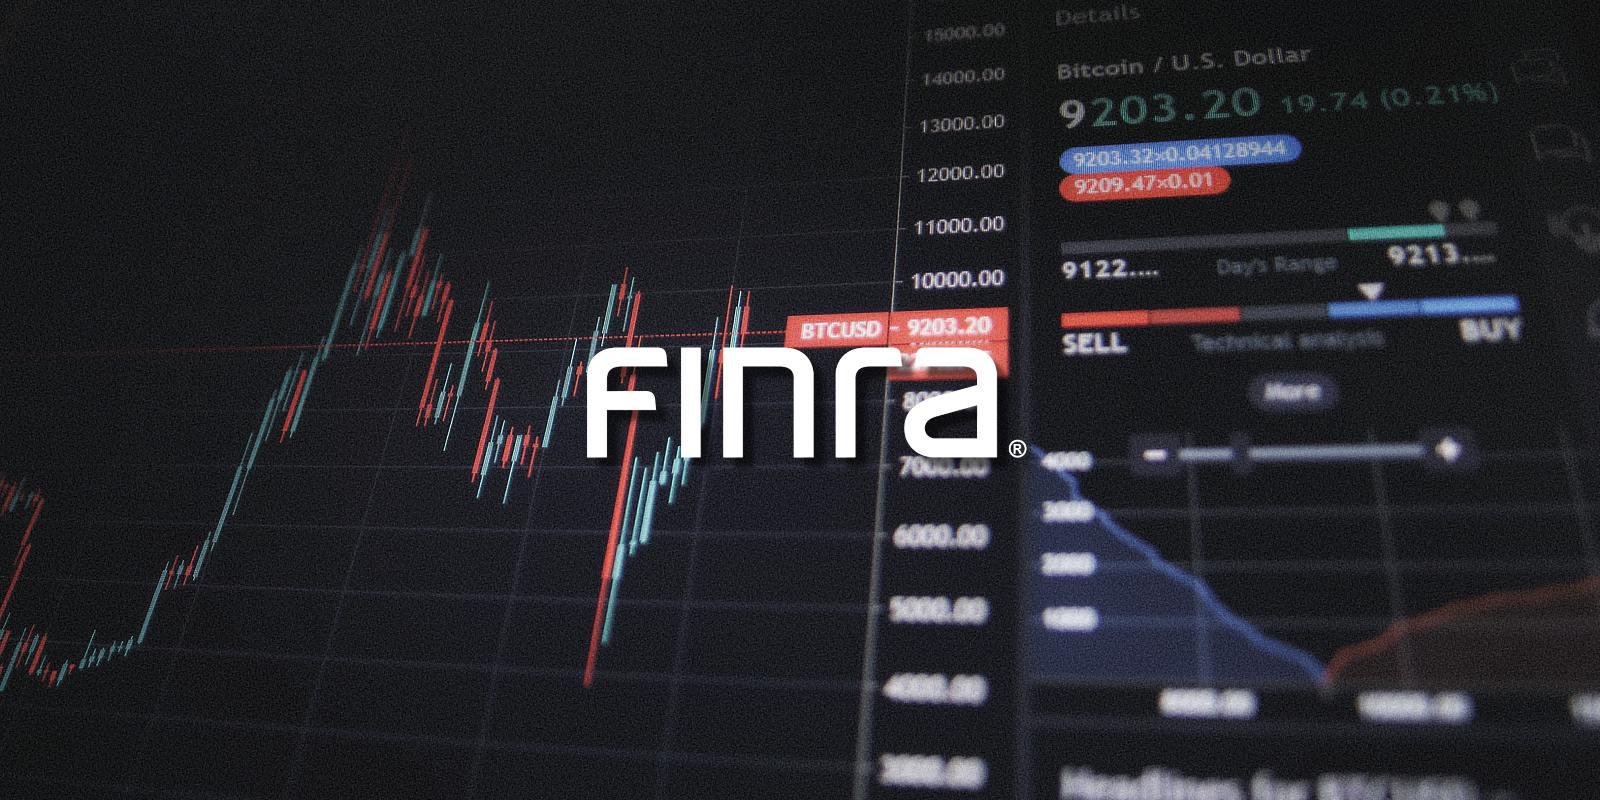 Phishing targets US brokerage firms using FINRA lookalike domain